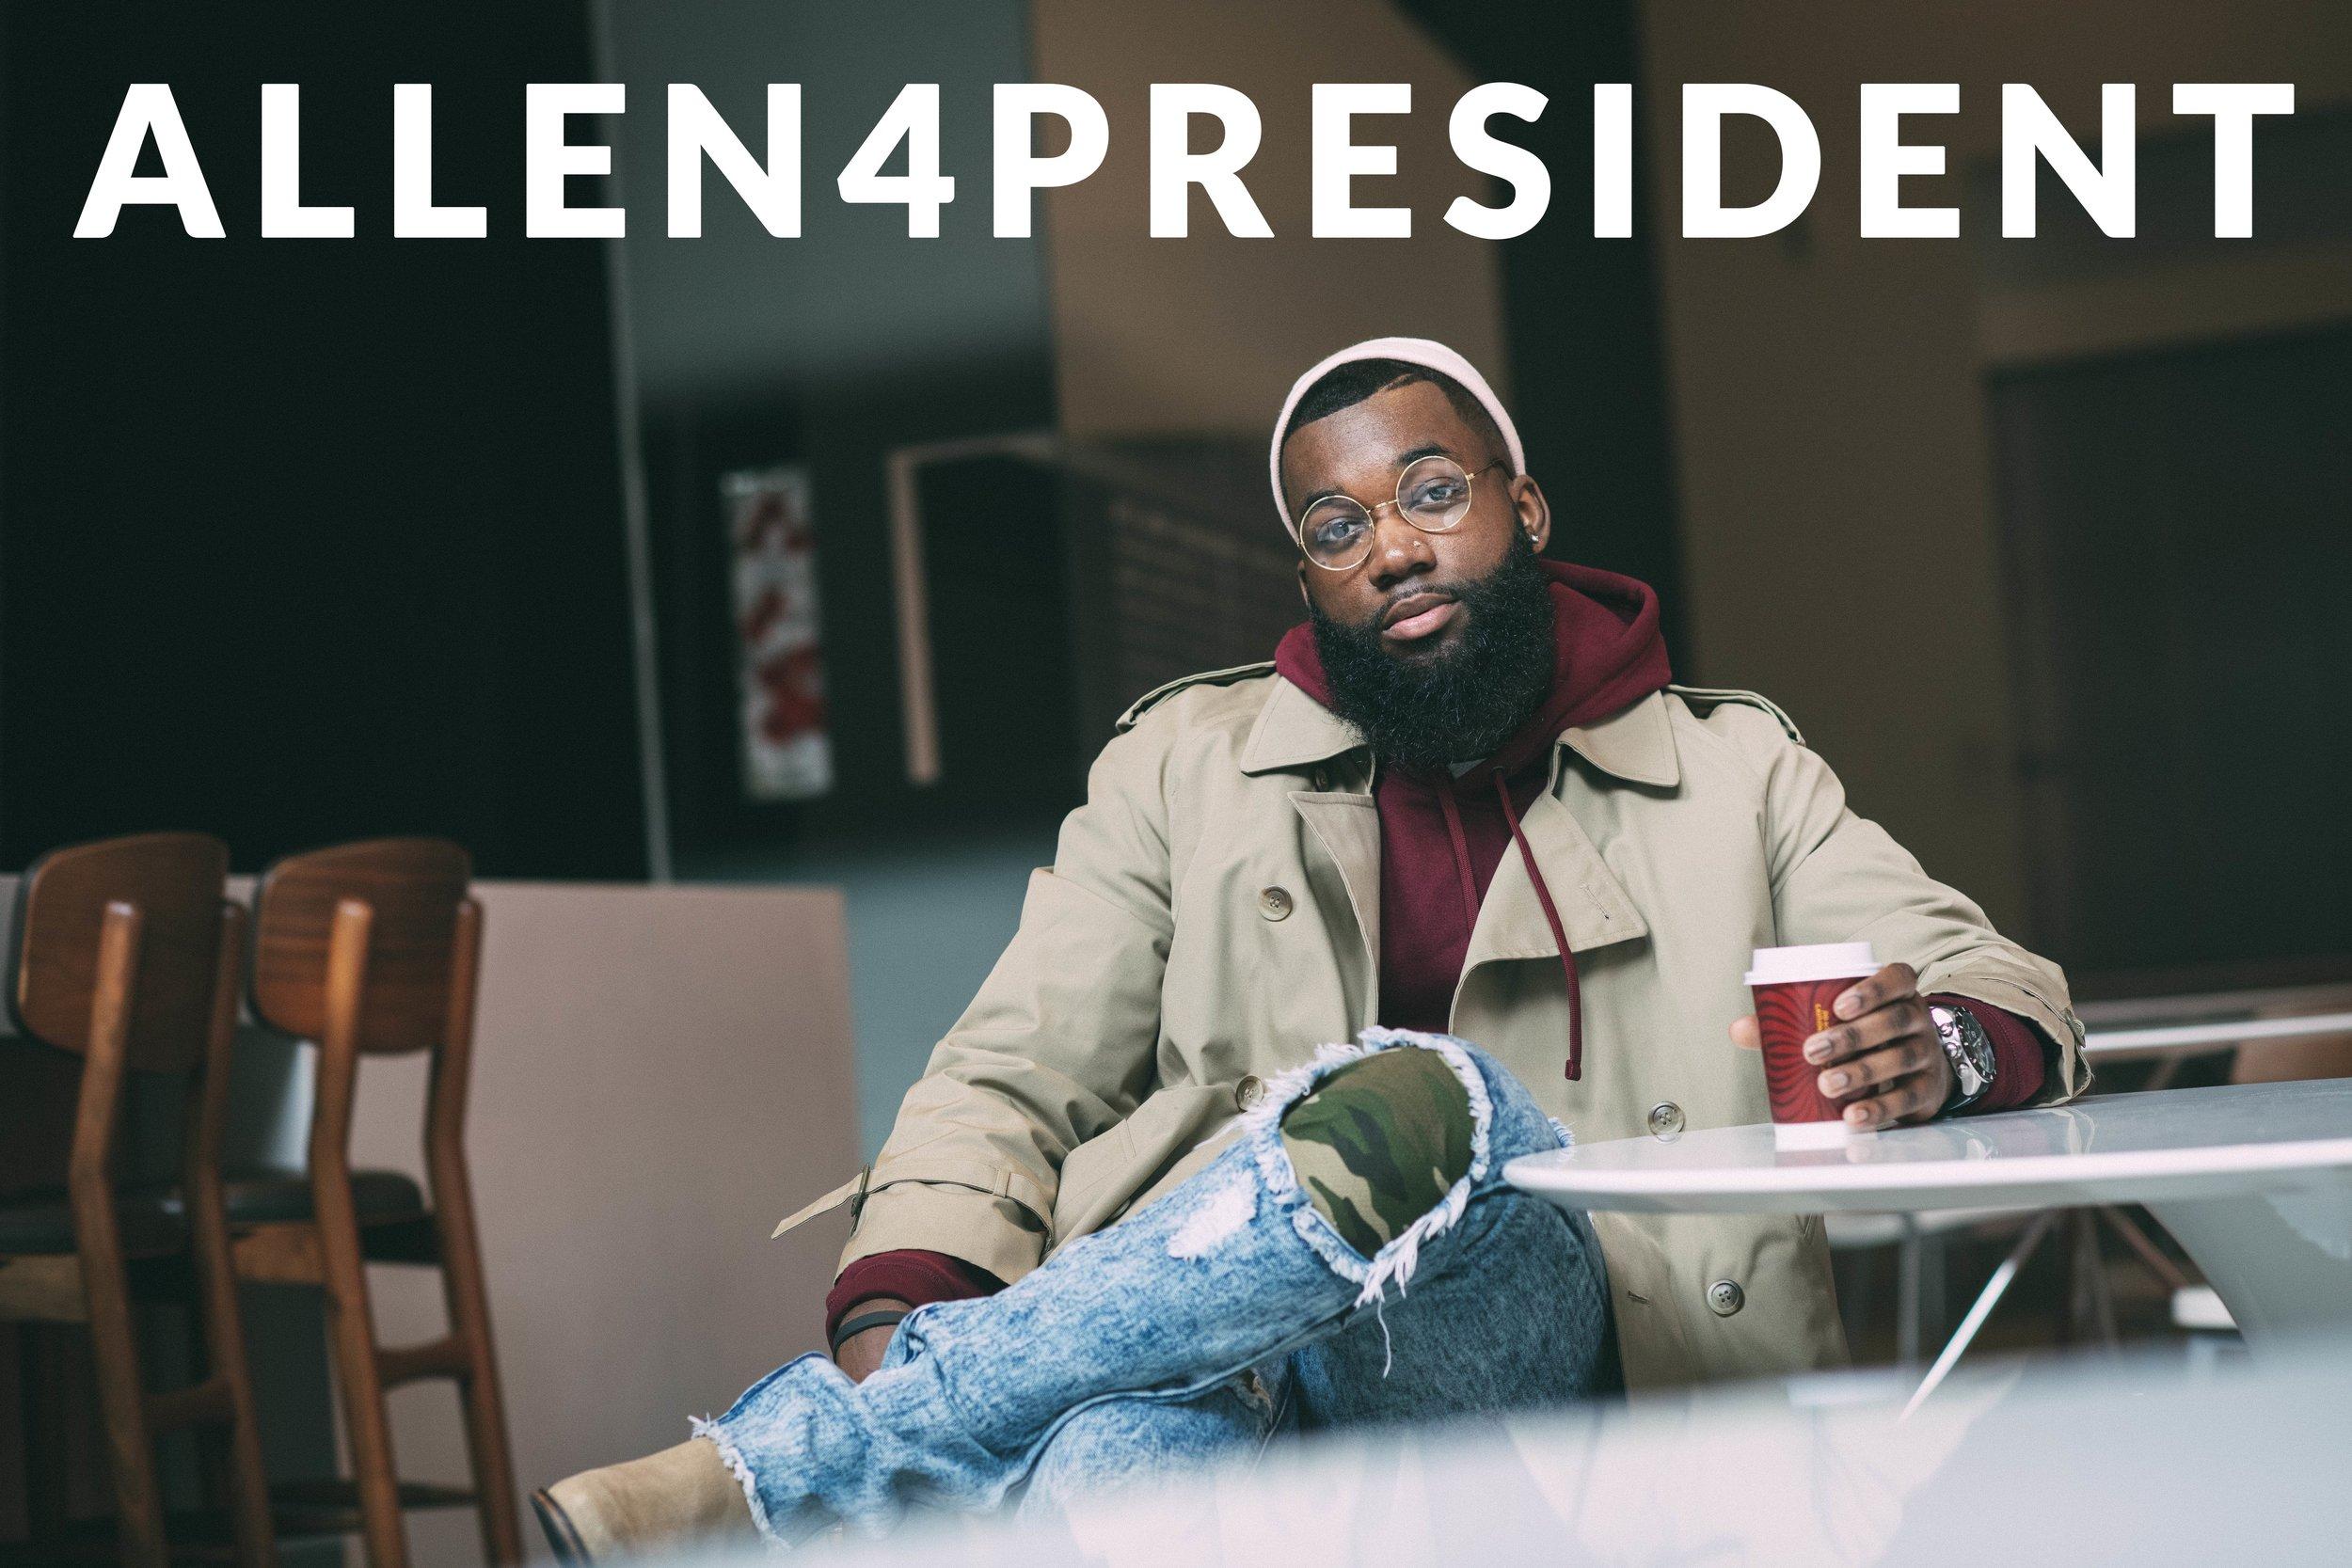 Allen4President TEXT lo res.jpg